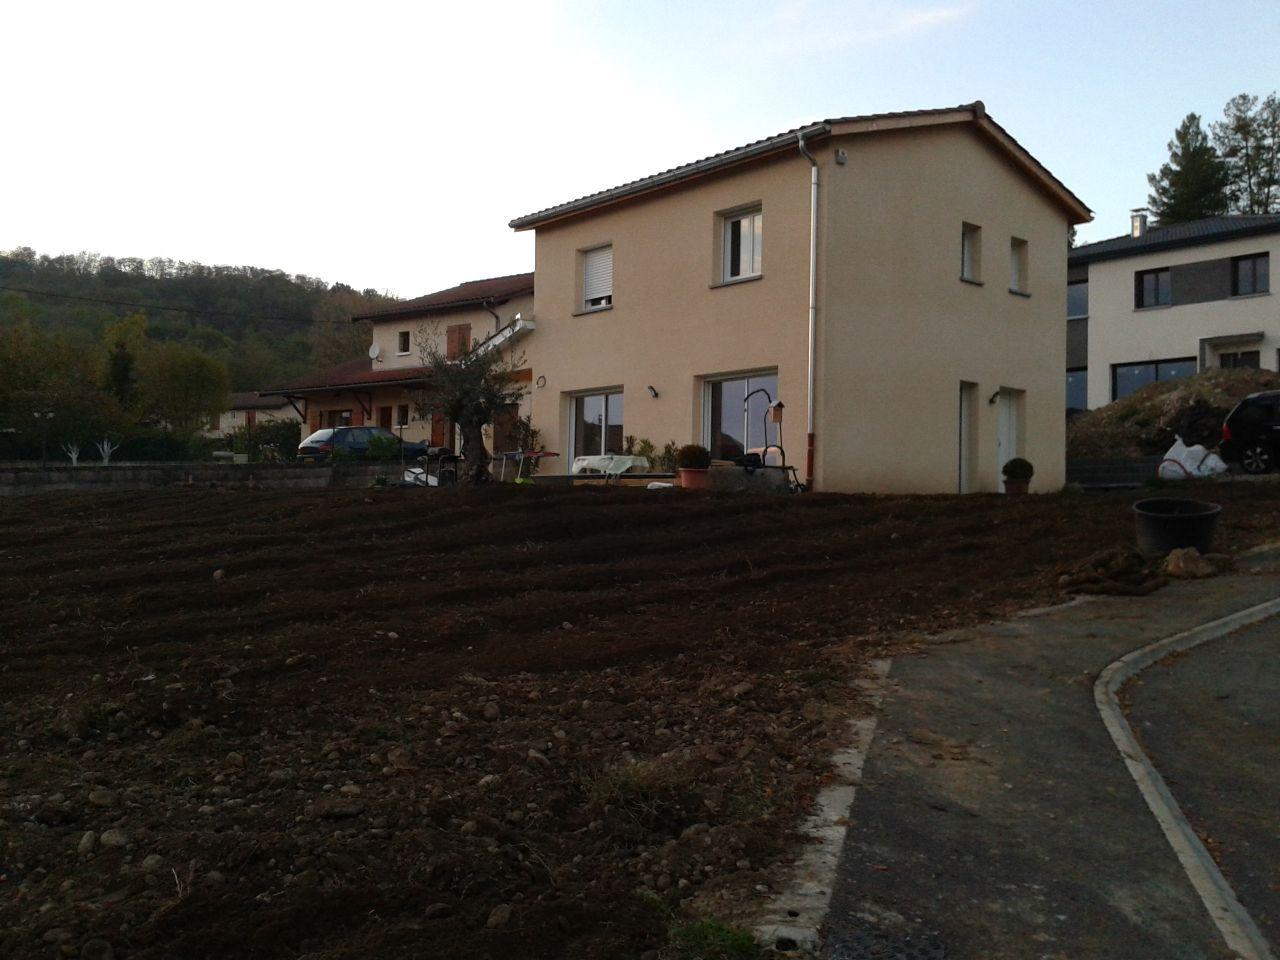 Photo pr paration du terrain avant gazon v g taux plantation haies ain 1 - Preparer son terrain avant pelouse ...